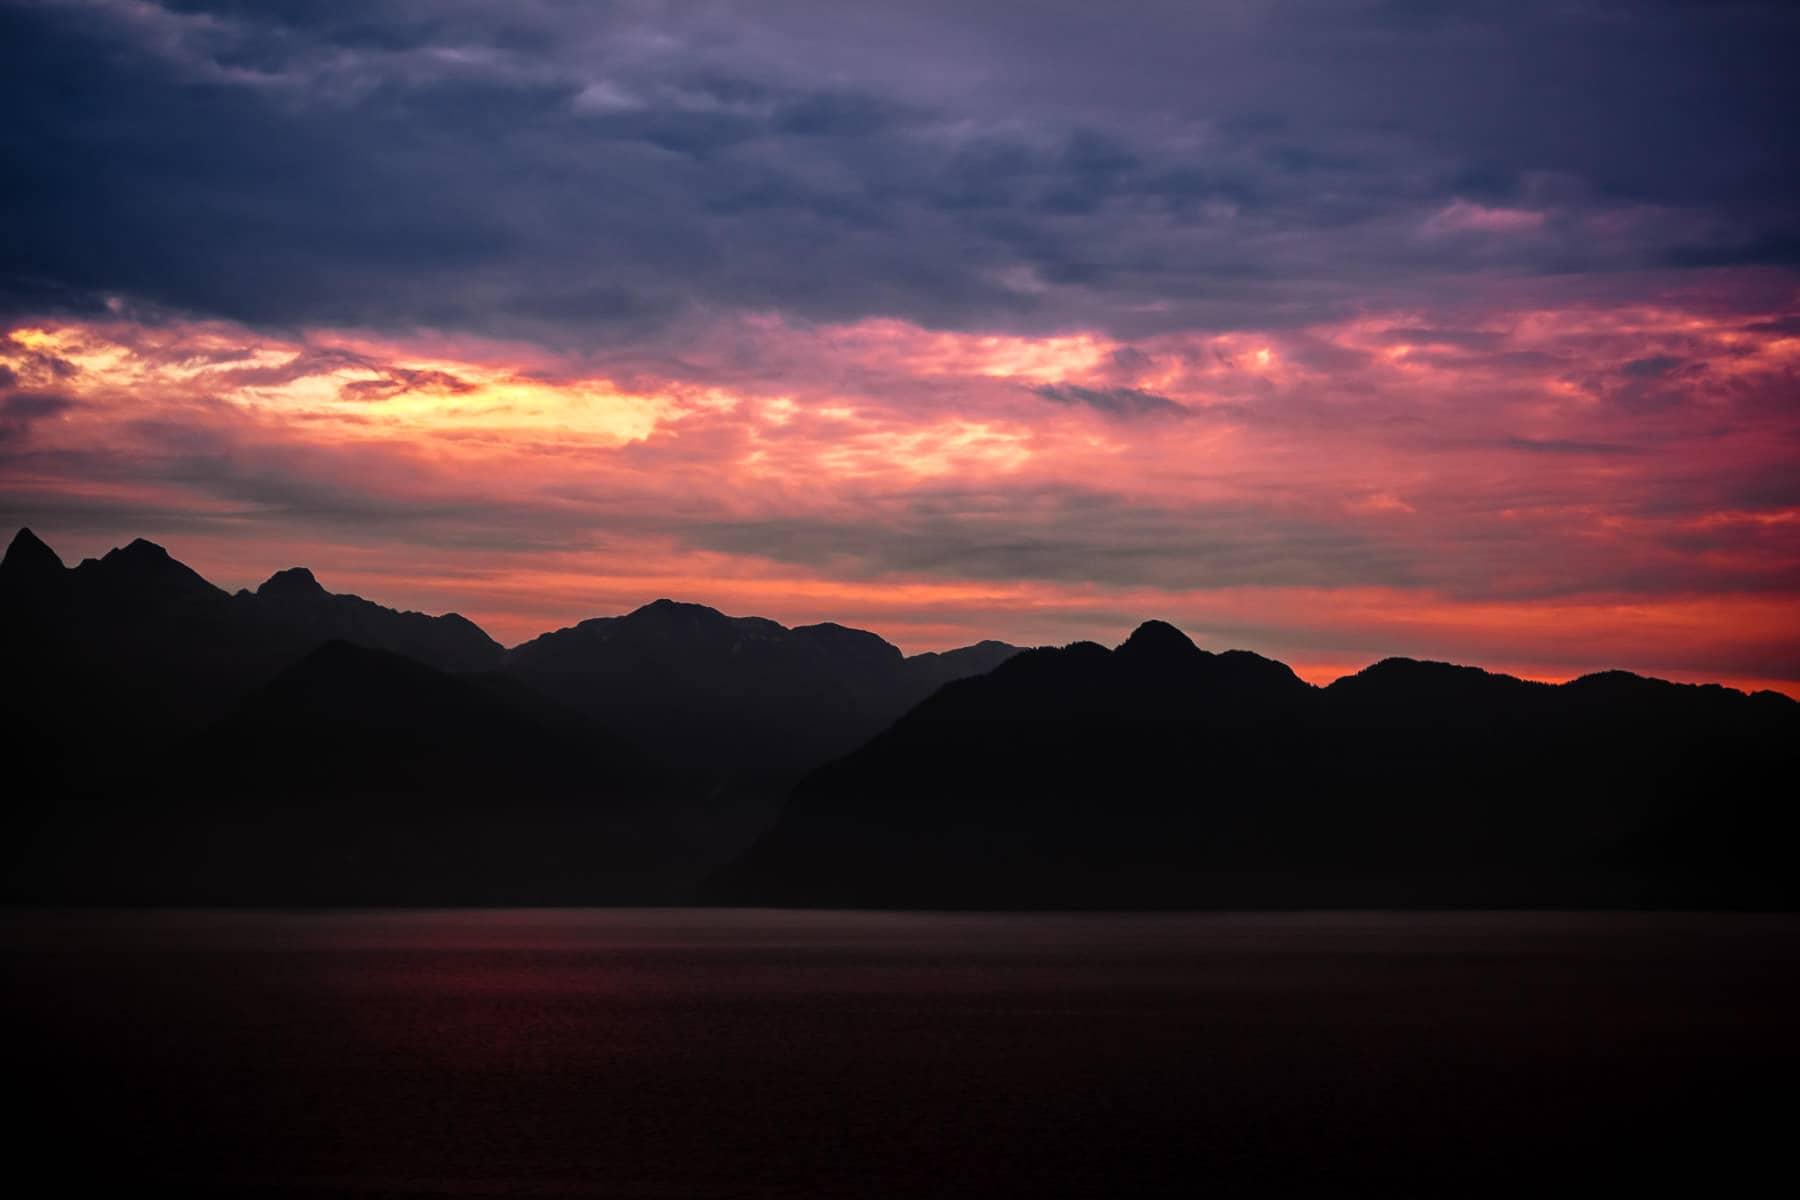 The morning sun silhouettes mountainous islands along Alaska's Stephens Passage.